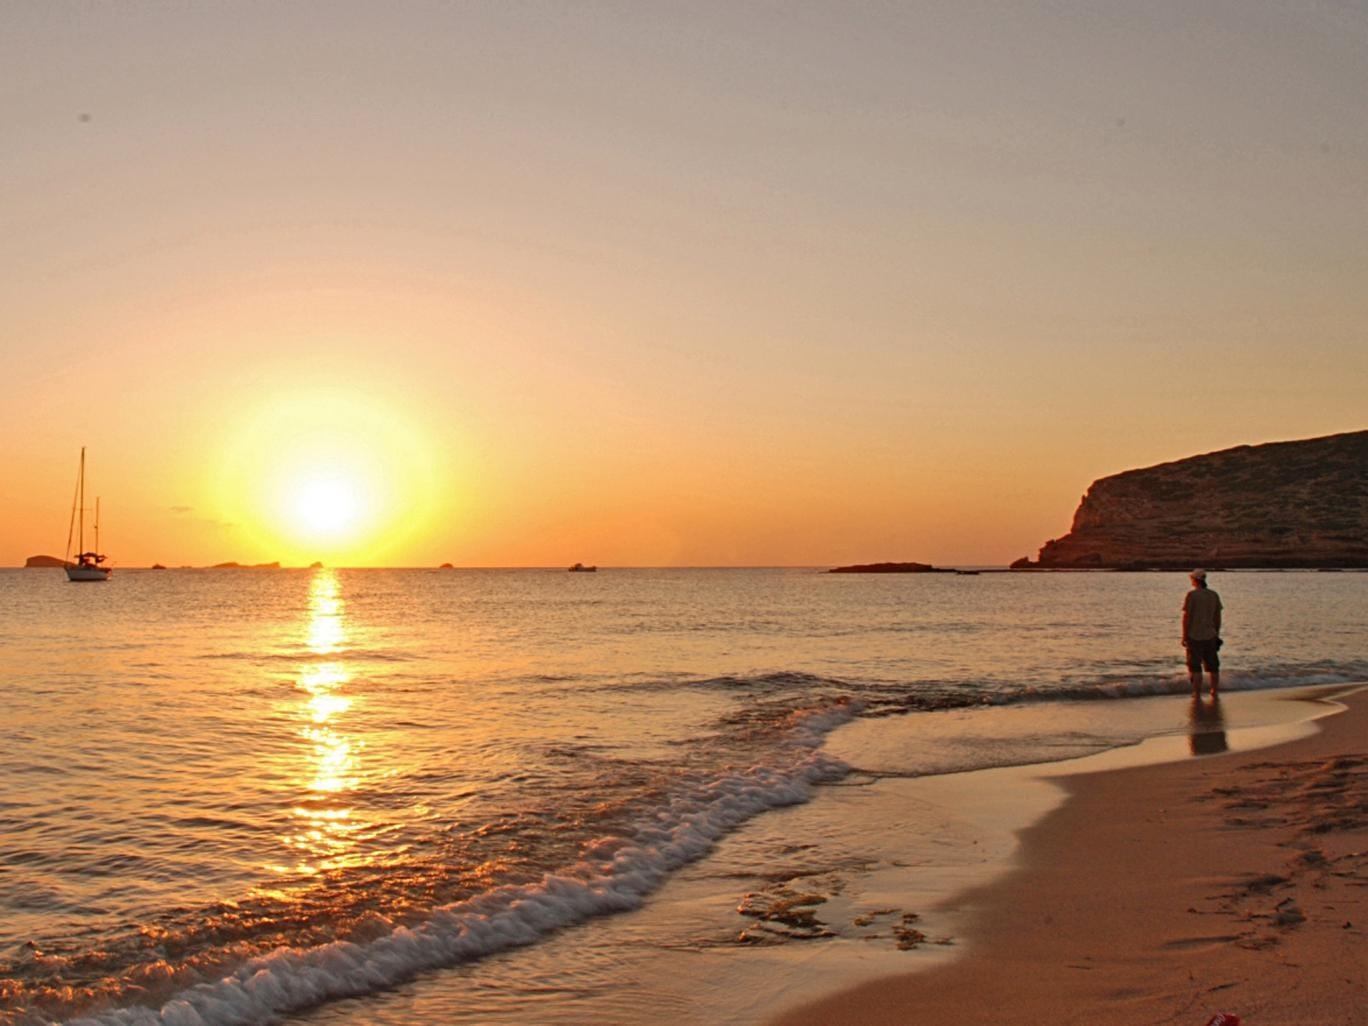 Dark night rises: the sun sets on the island of Ibiza